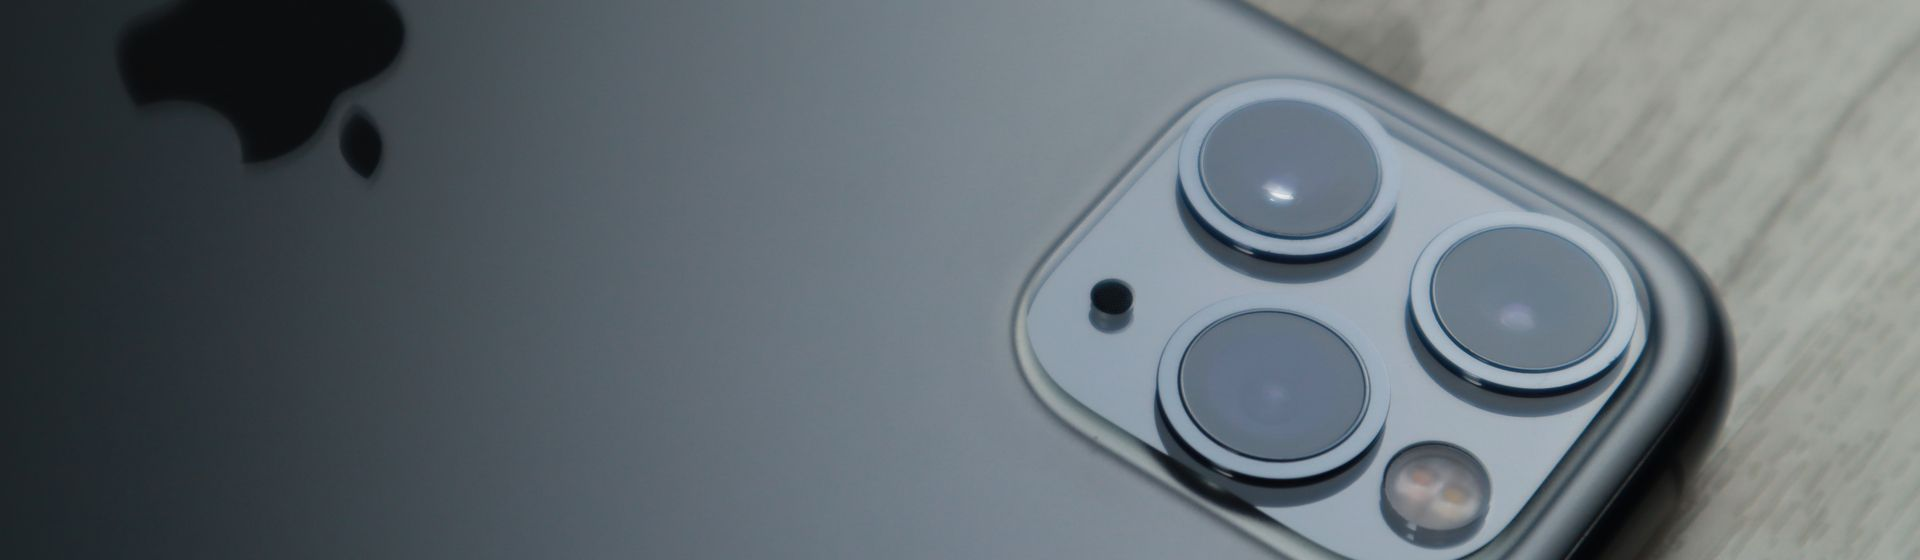 iPhone 11 Pro Max: Veja a análise e ficha técnica do celular da Apple